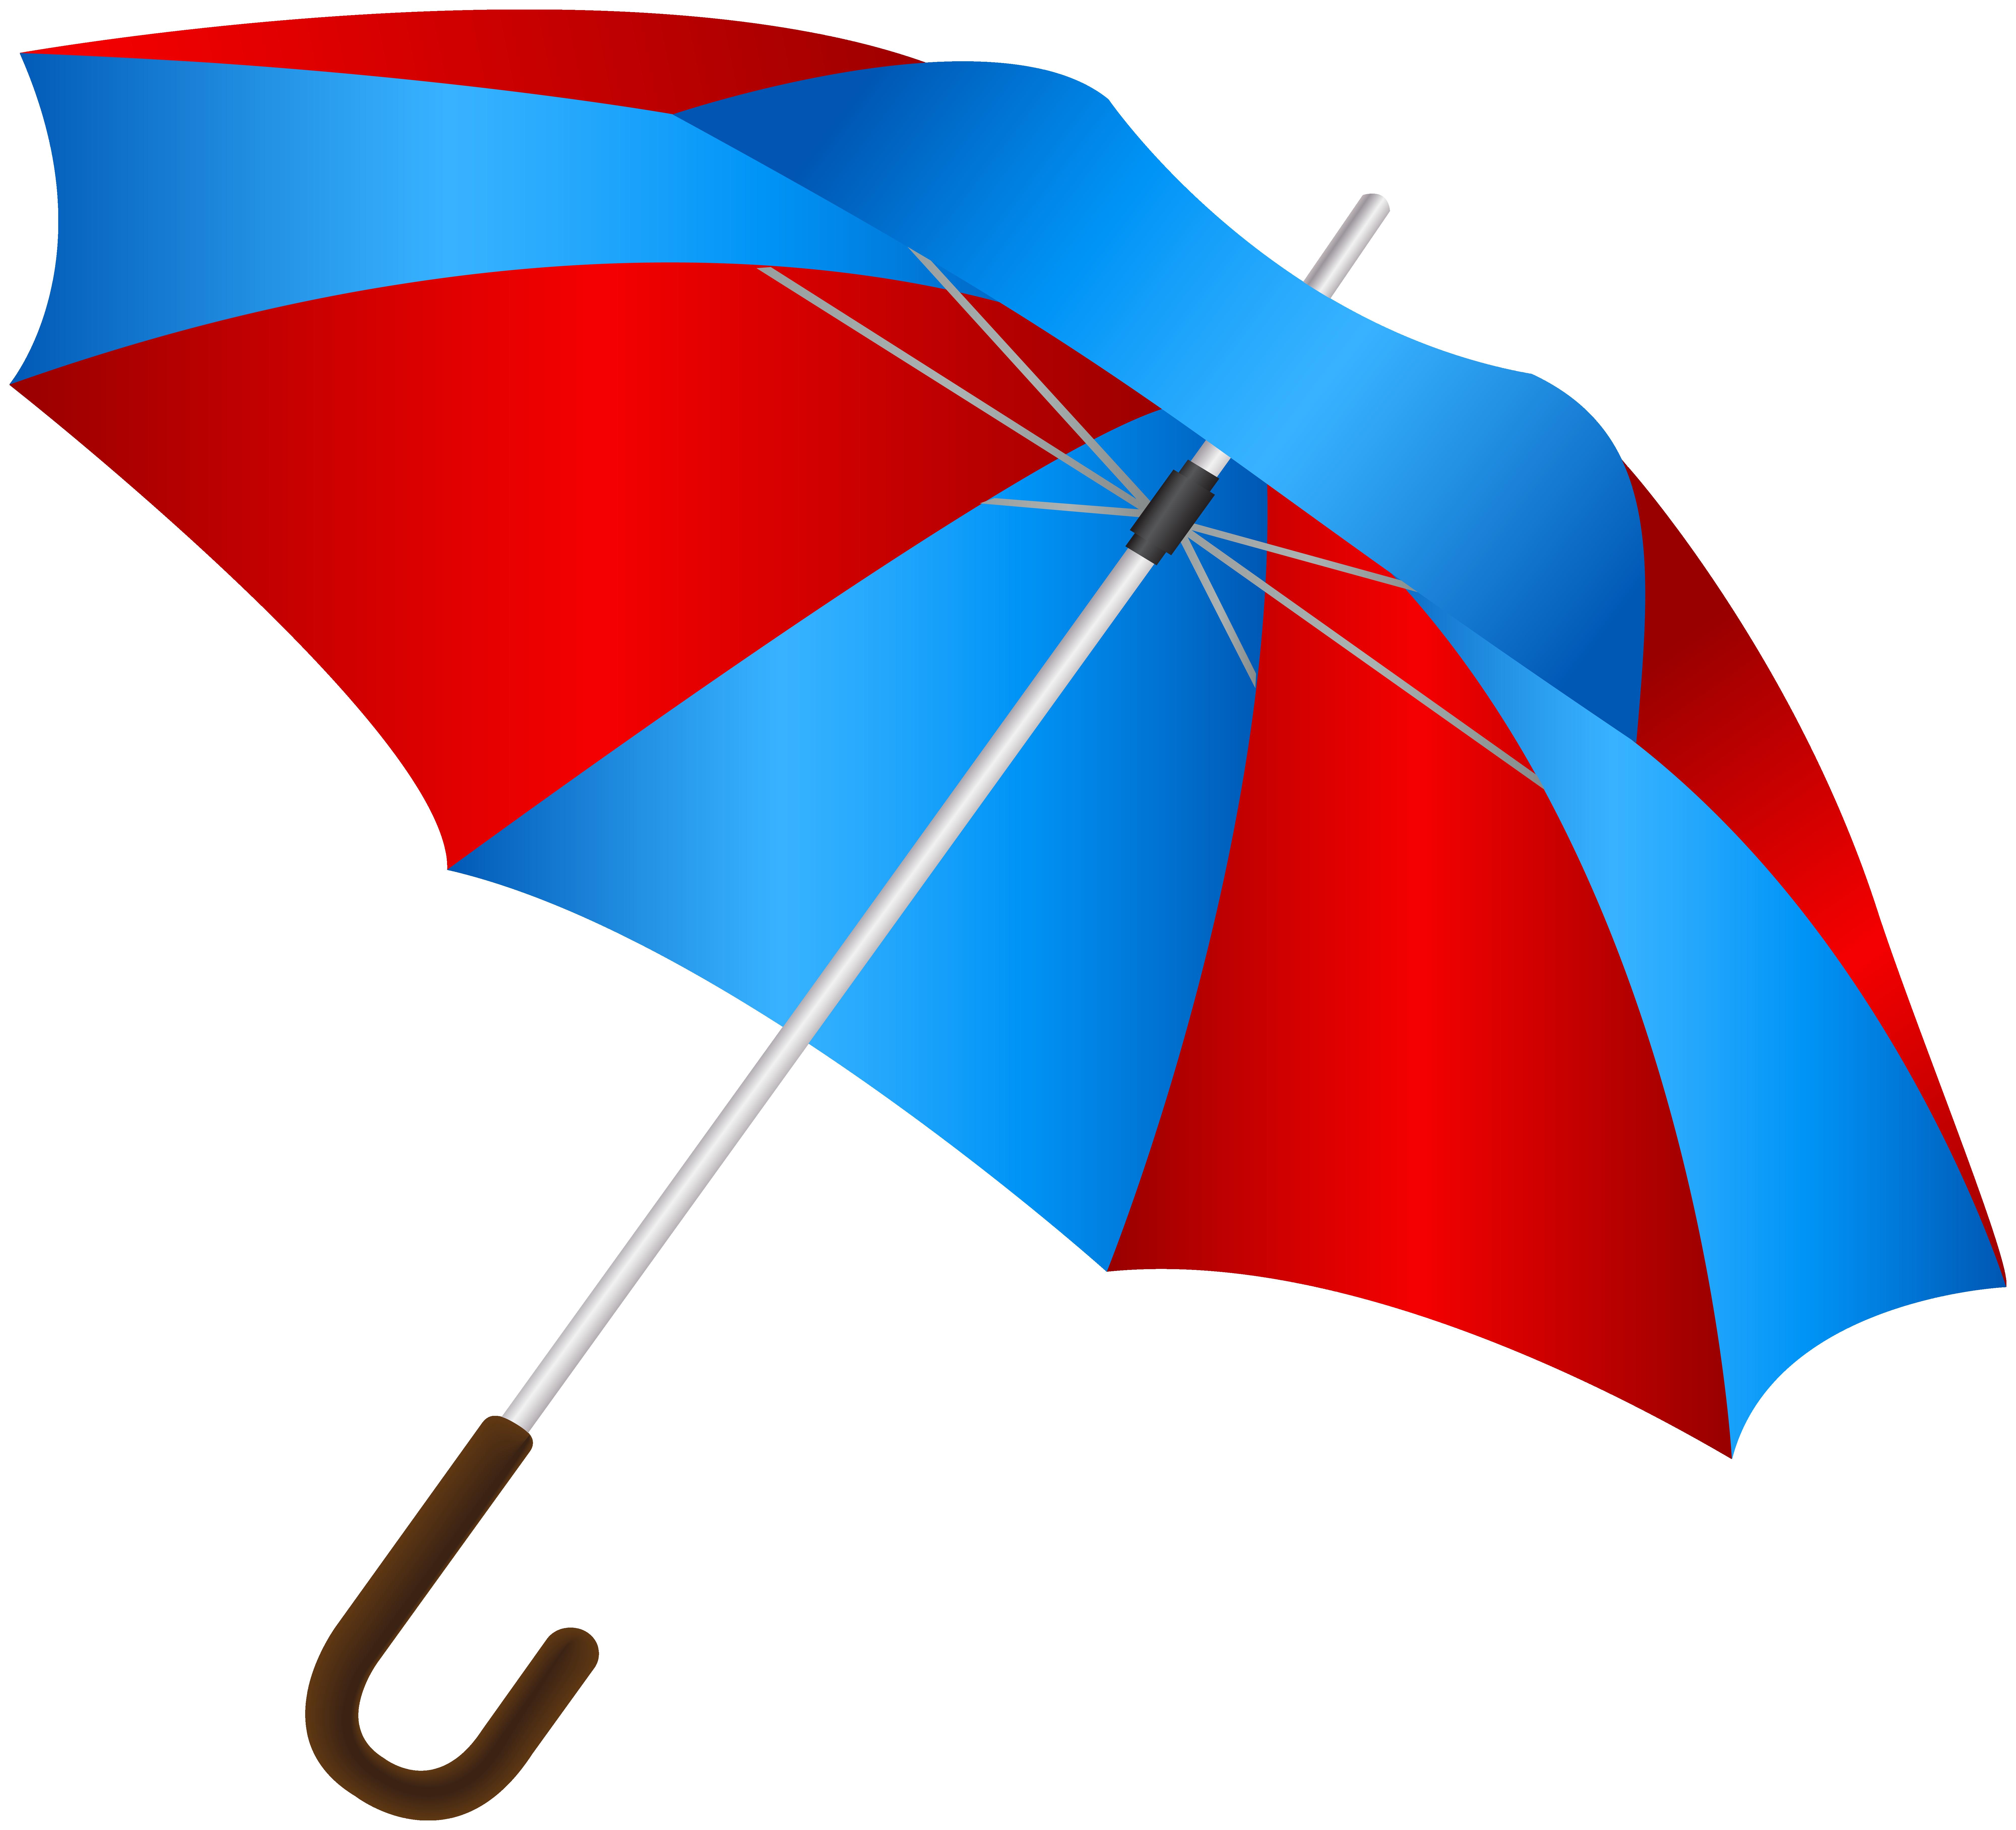 Umbreala clipart jpg transparent stock Blue Red Umbrella PNG Clip Art Image | Gallery Yopriceville ... jpg transparent stock